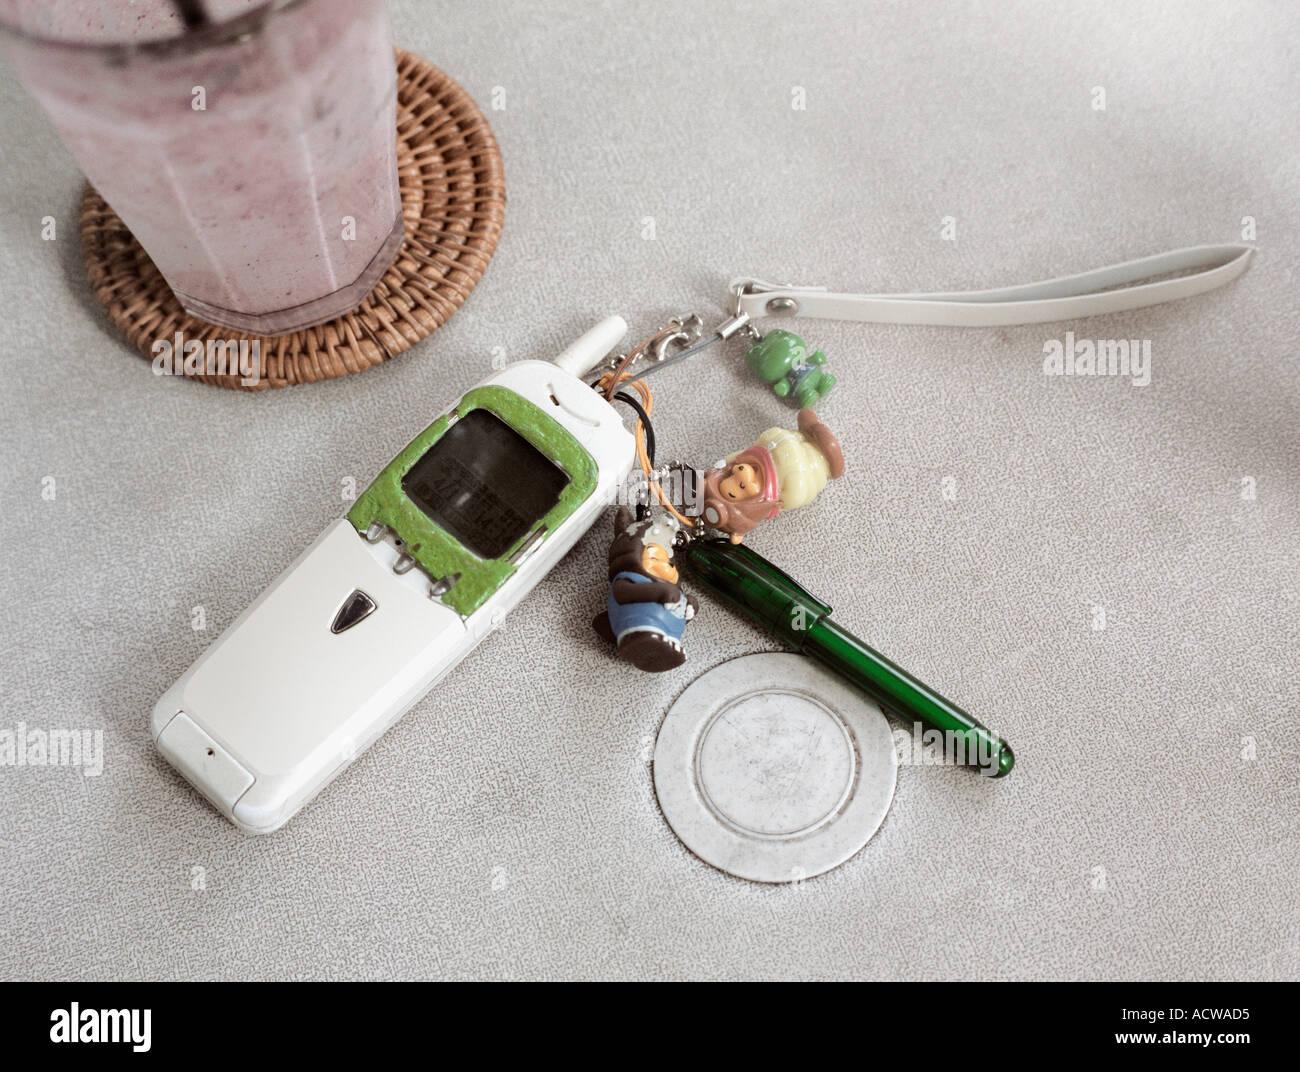 Cellular telephone and keyring - Stock Image